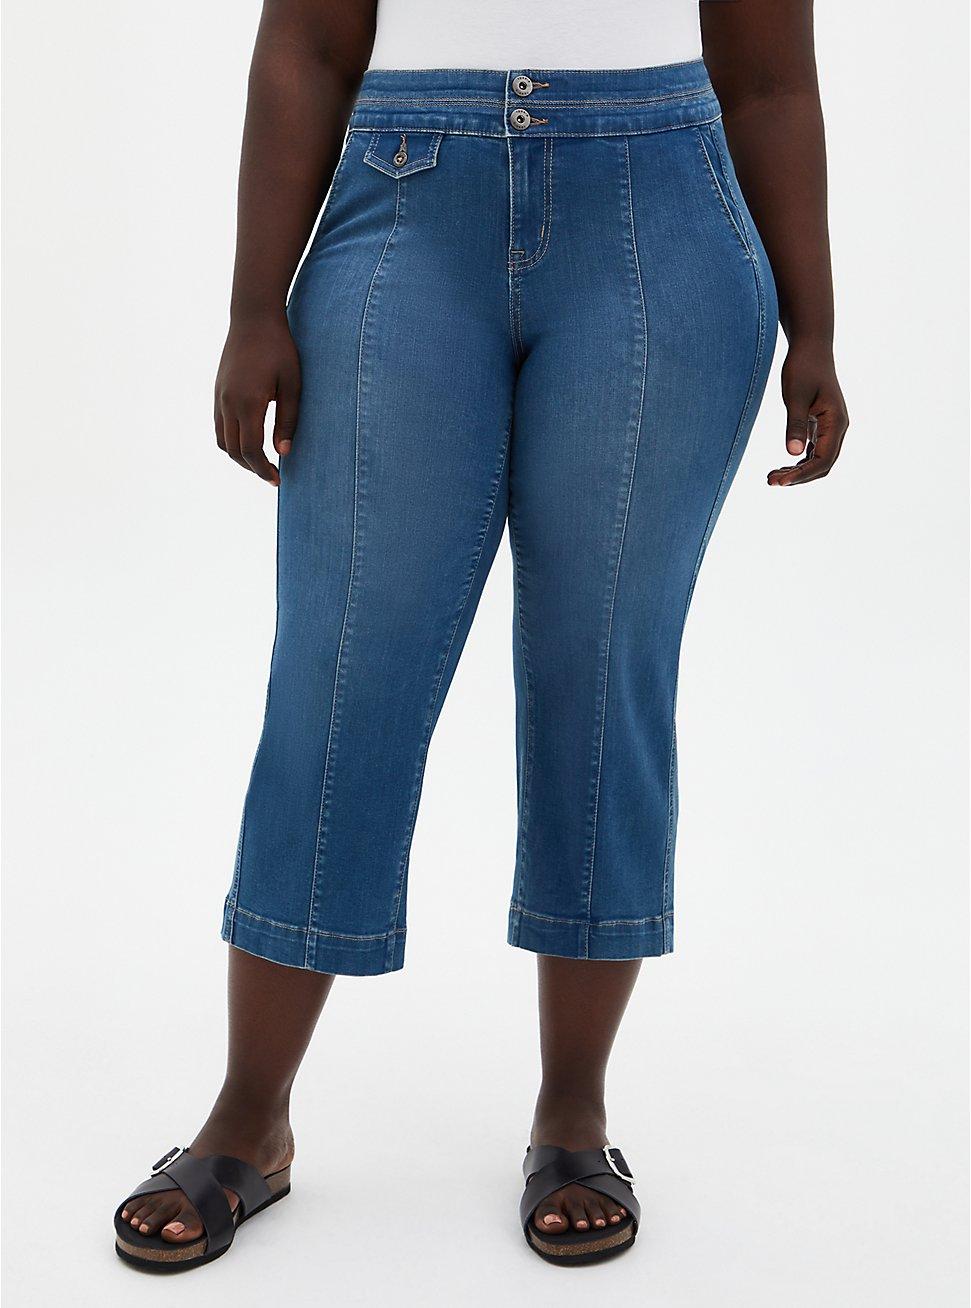 Crop High Rise Wide Leg Jean - Super Soft Medium Wash, , fitModel1-hires